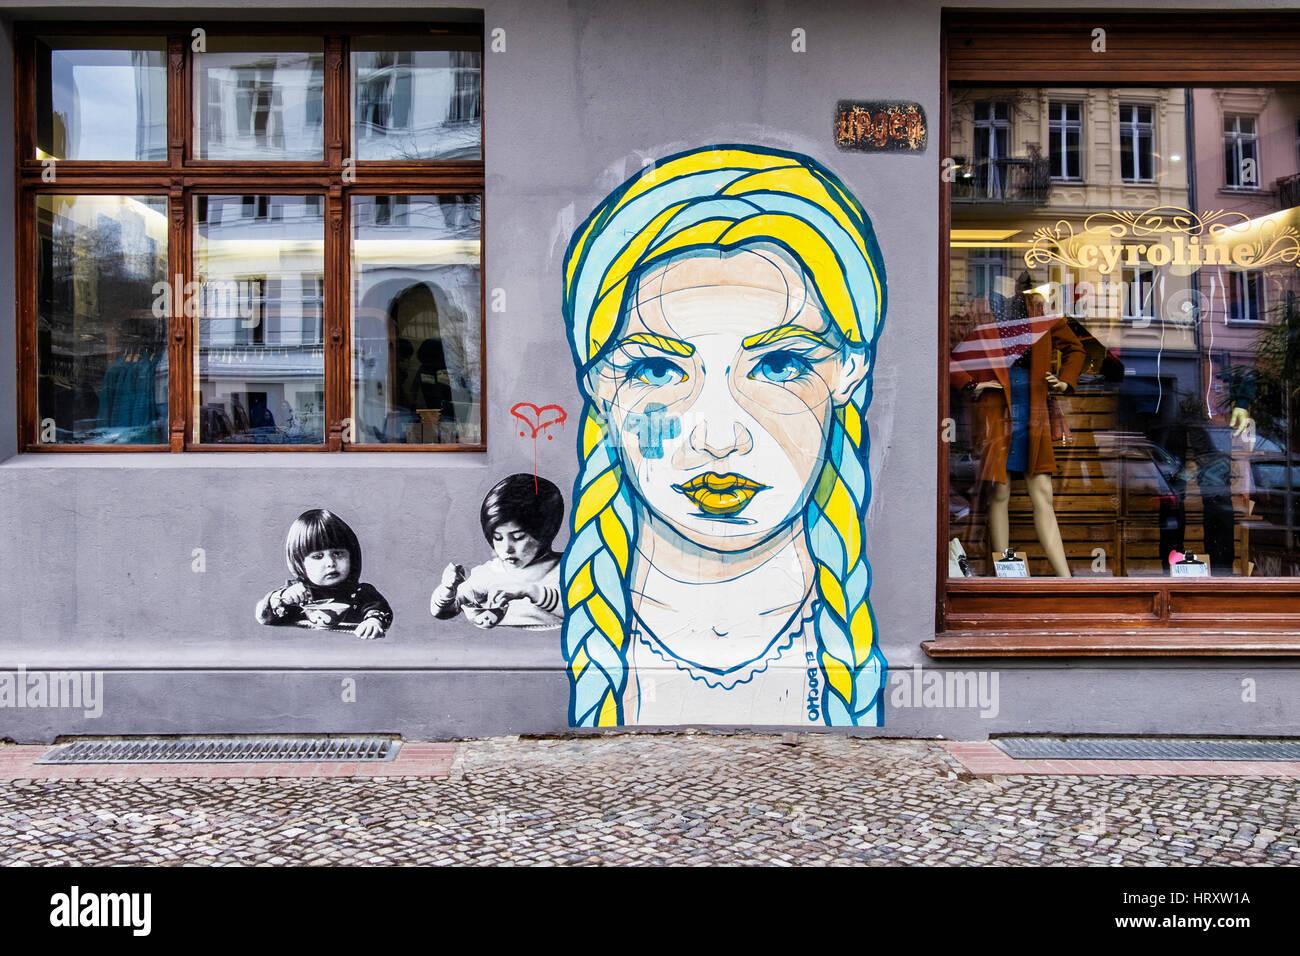 Berlin, Prenzlauer Berg. Street scene, Cyroline Upmarket clothing shop exterior and El Bocho street art - Stock Image